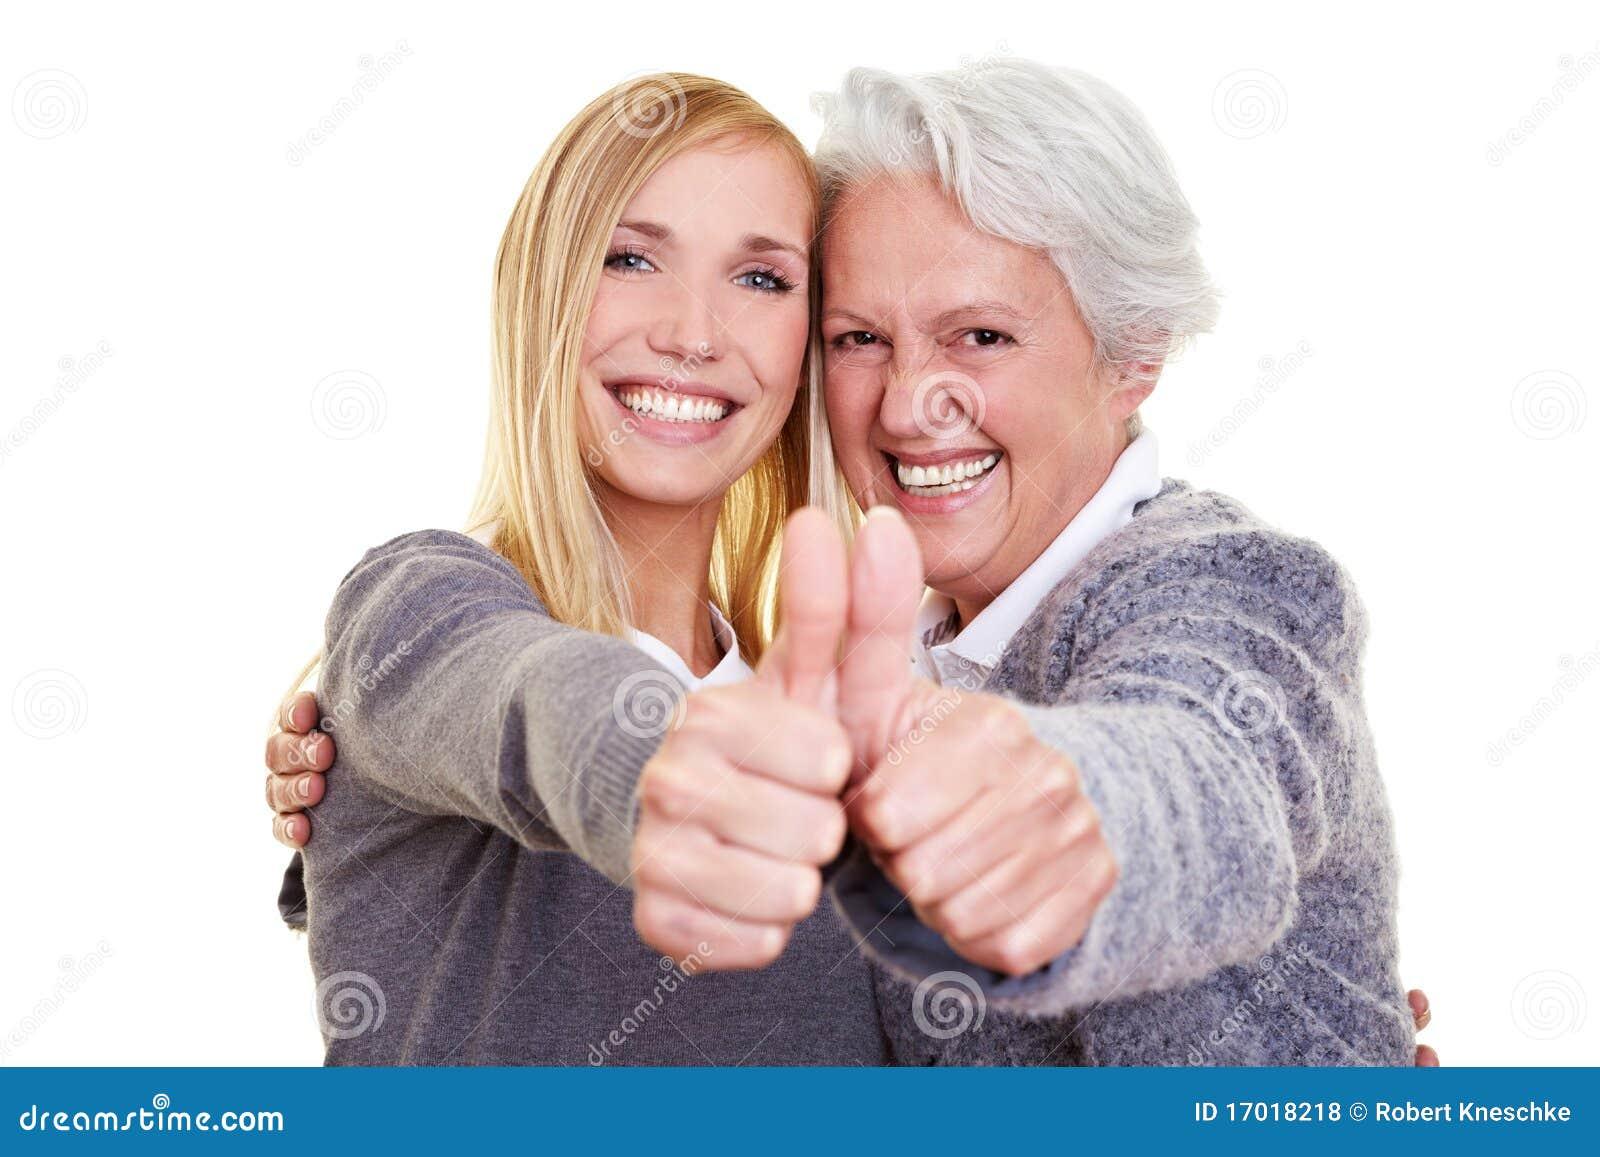 grandma and grandchild holding stock photo image of people